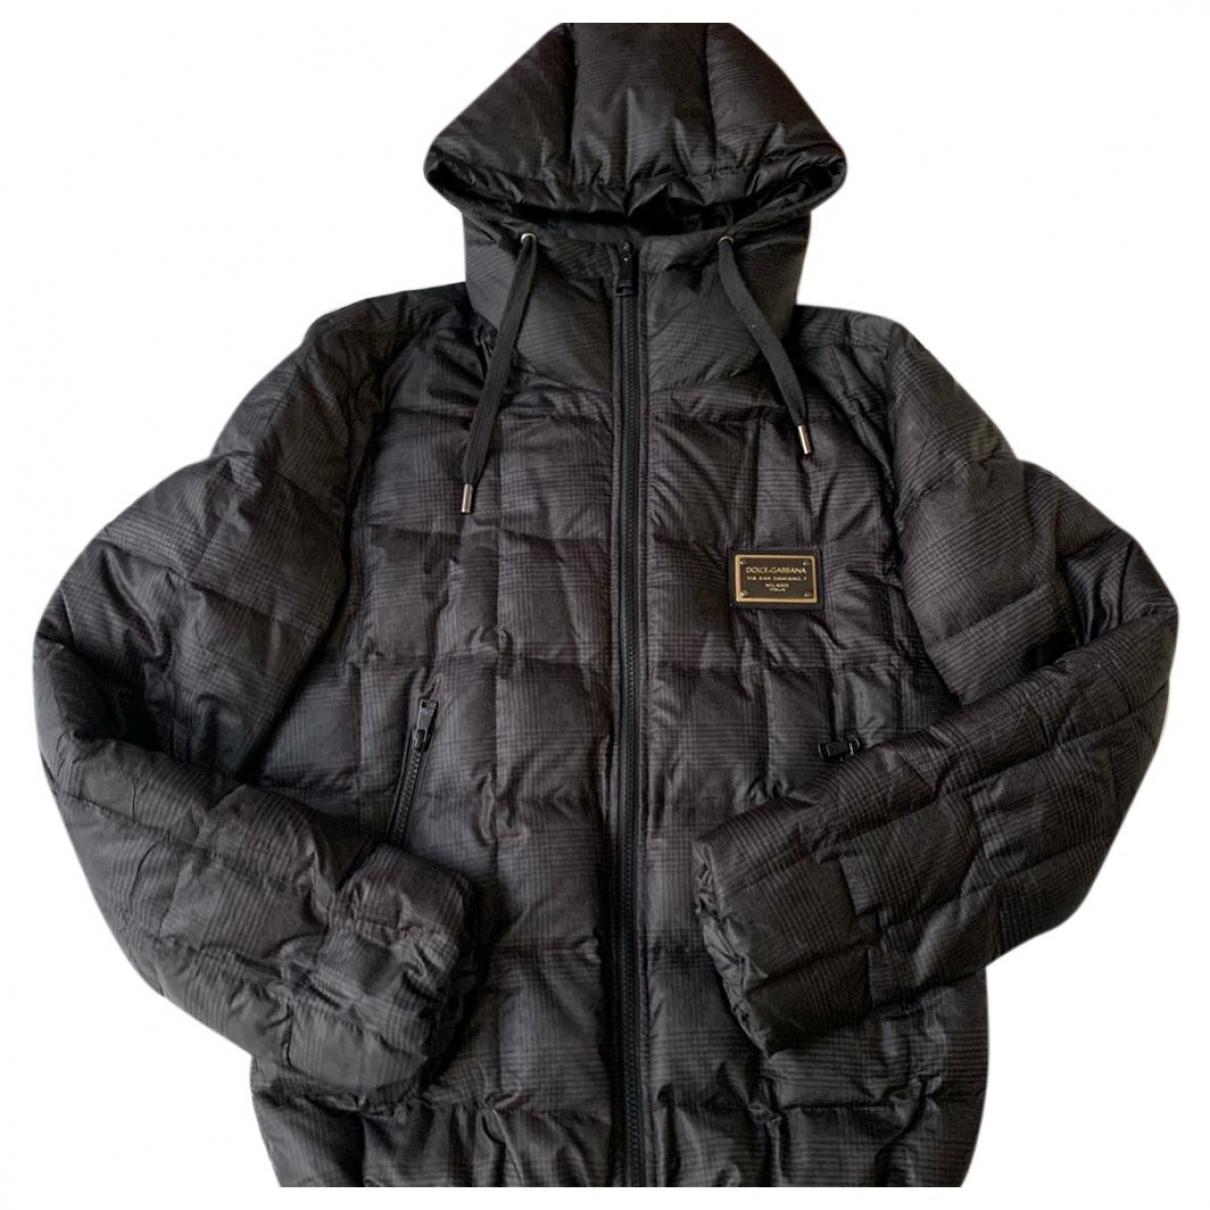 Dolce & Gabbana \N Grey coat  for Men S International